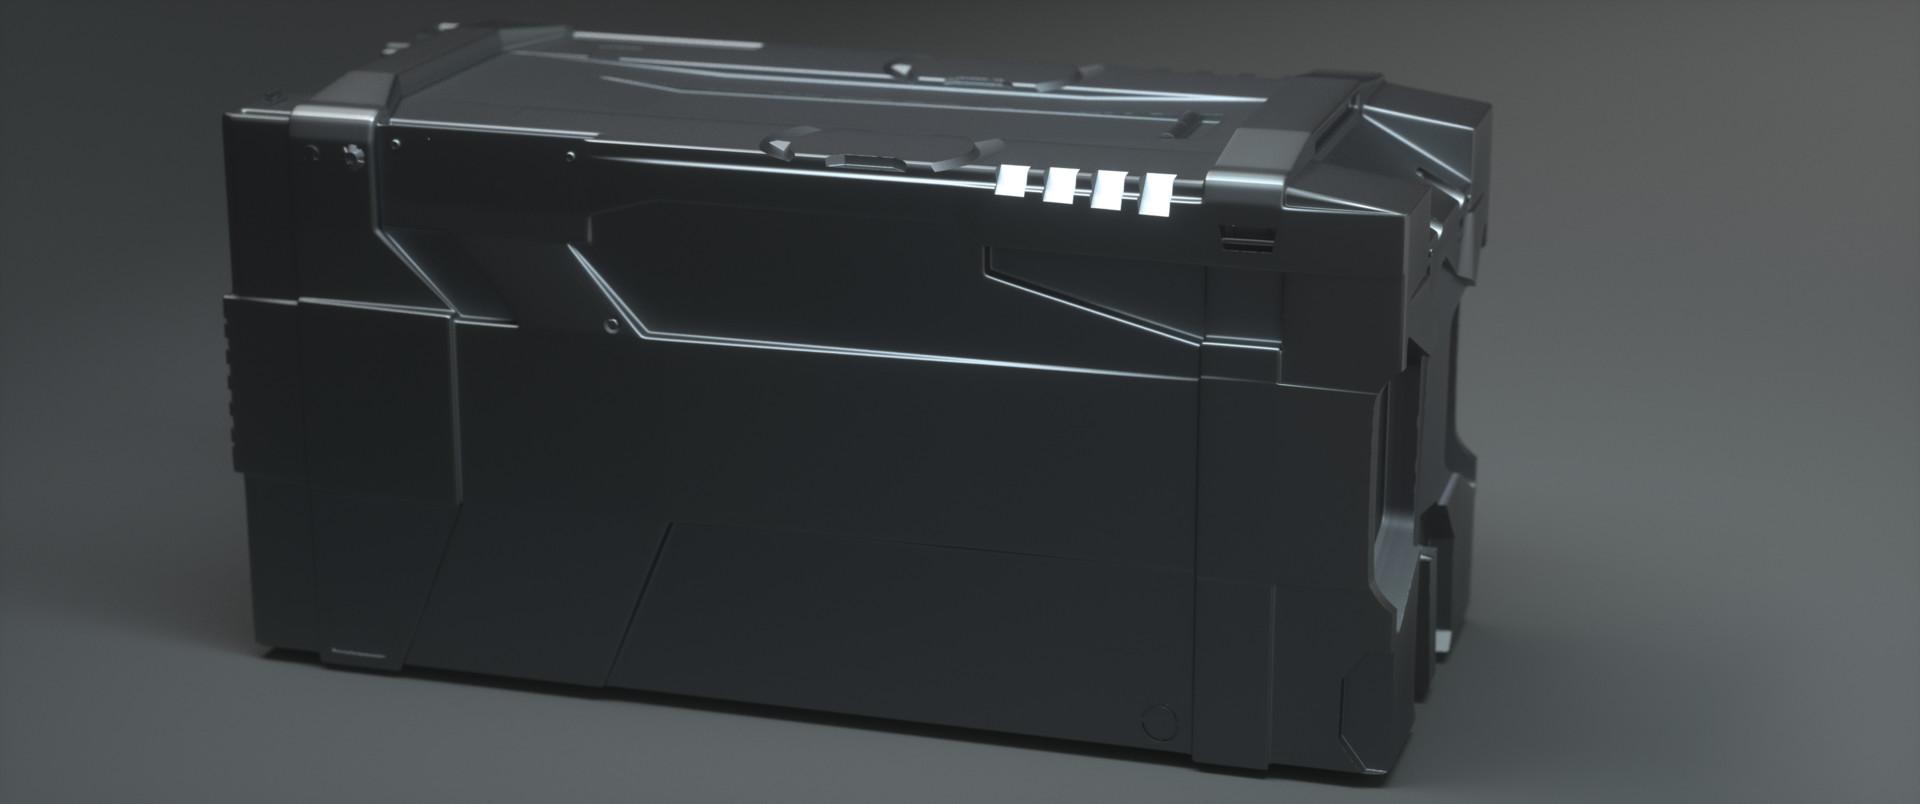 Kresimir jelusic robob3ar 493 breaking the box5